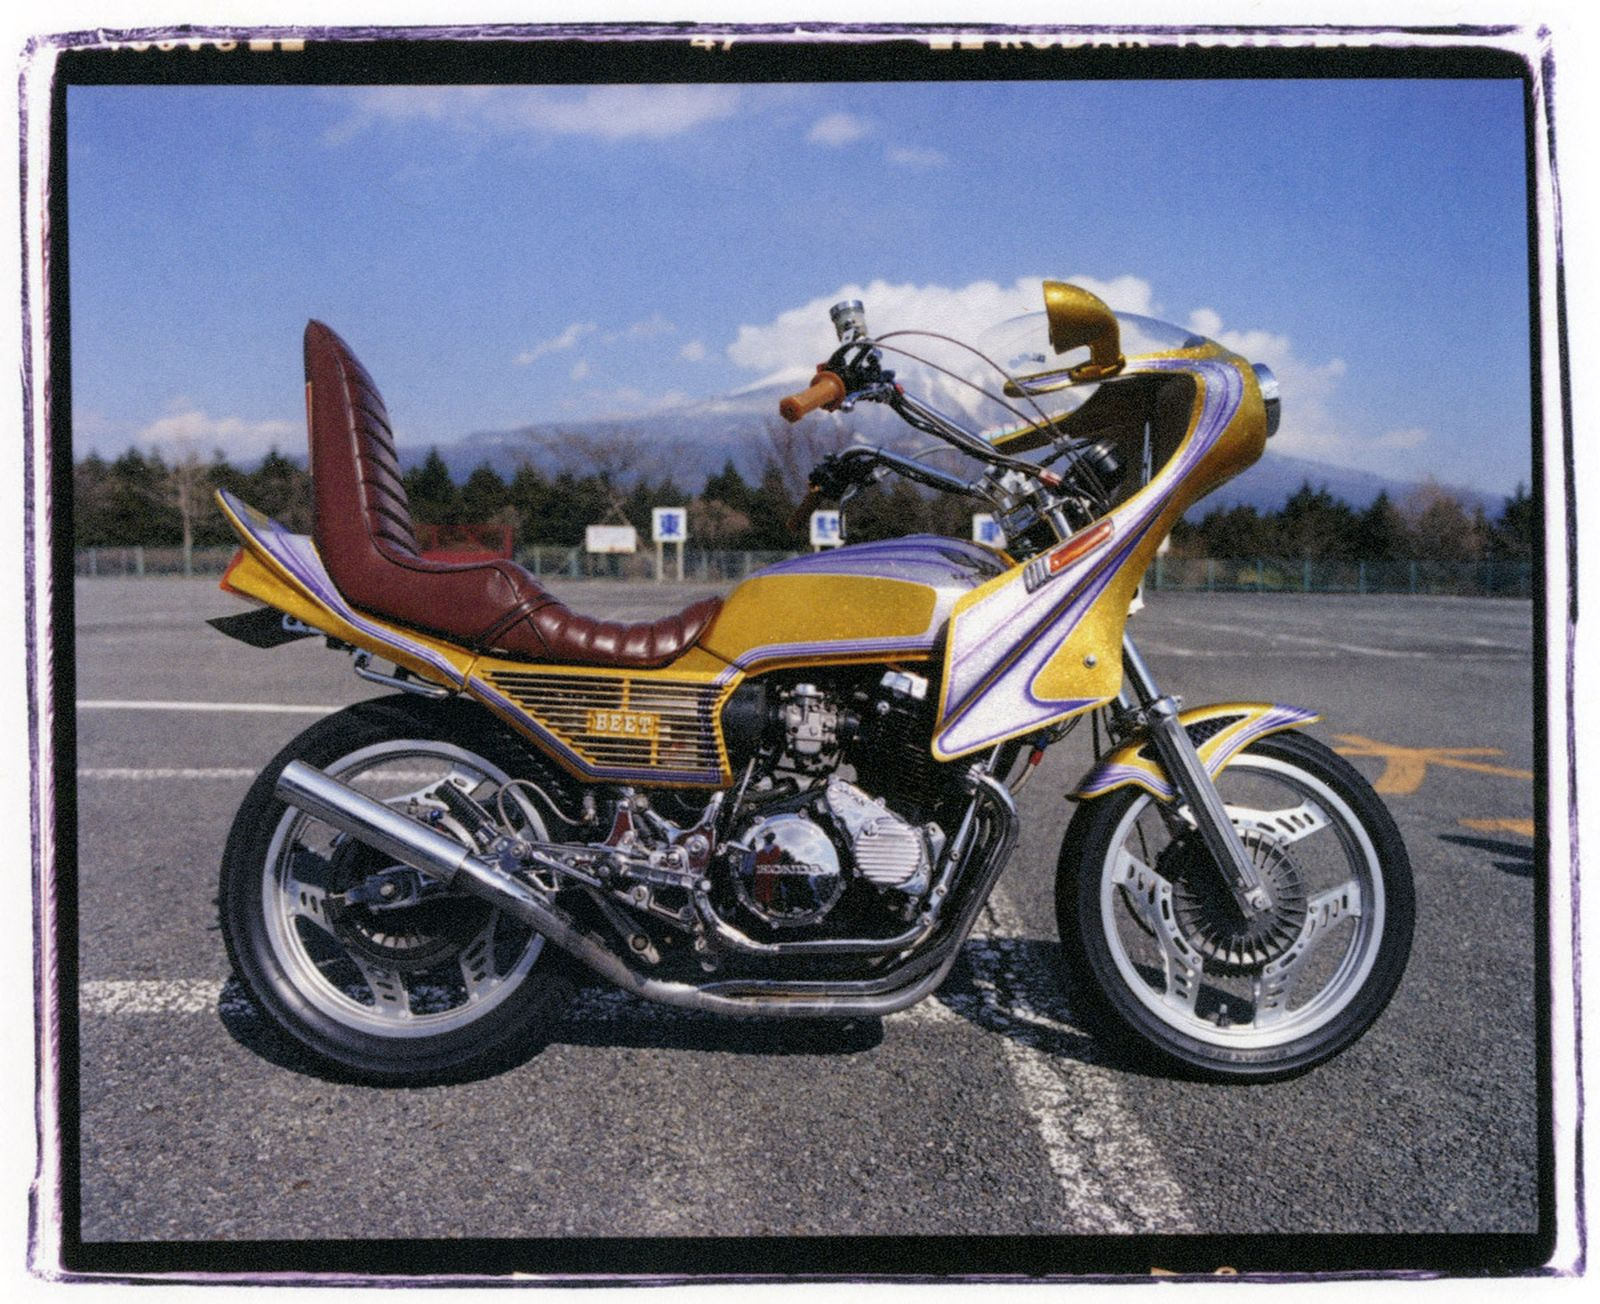 bosozoku-the-stylish-legacy-of-japans-rebel-motorcycle-gangs-6